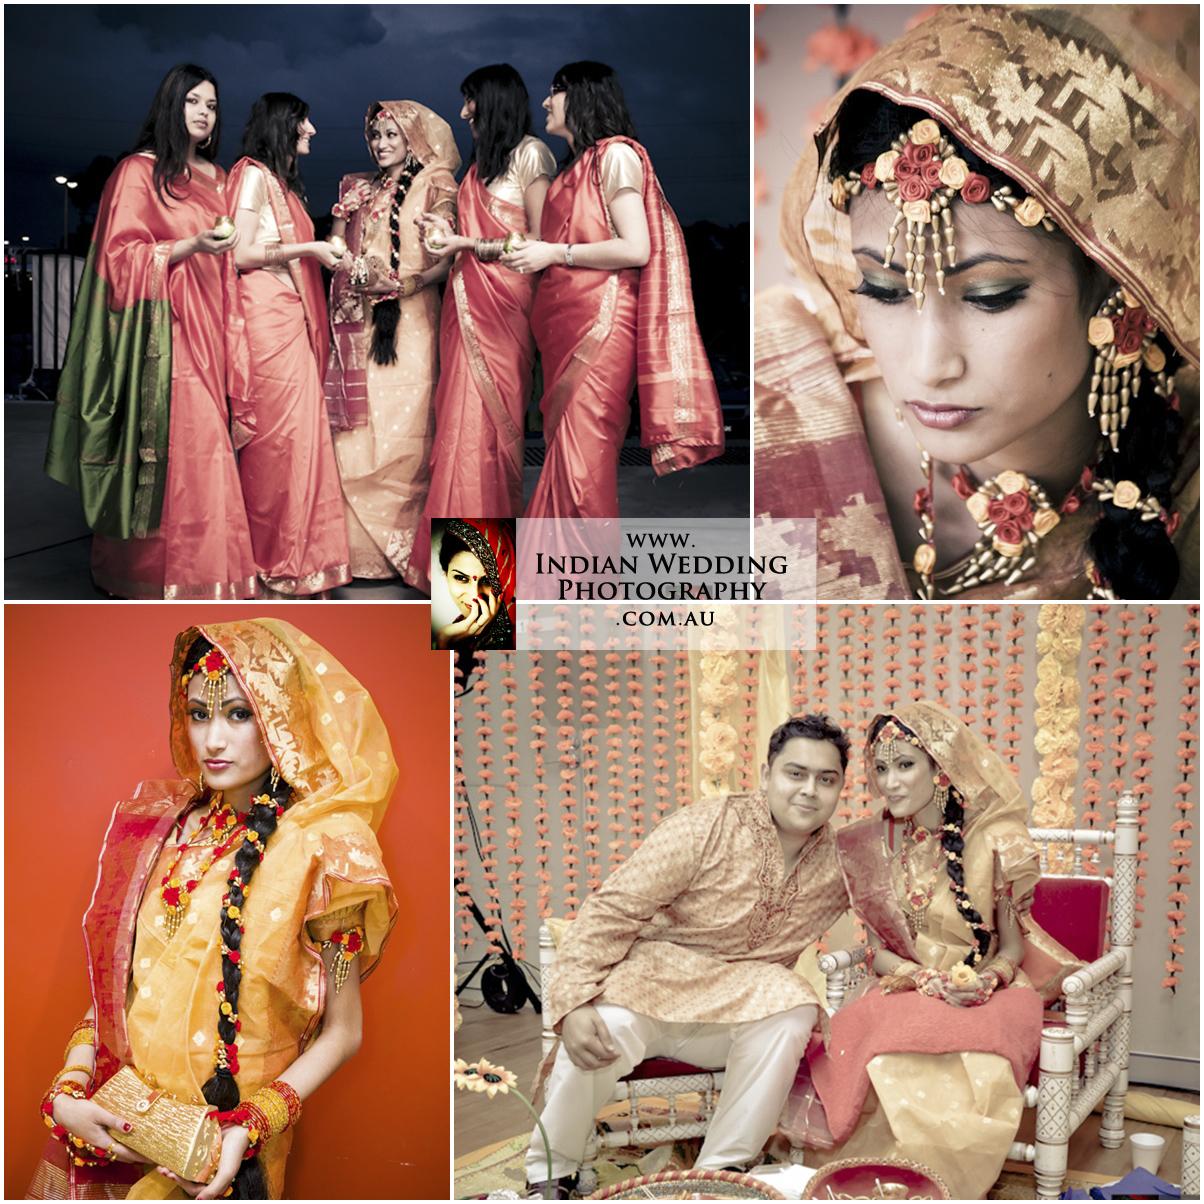 Indian Muslim Wedding Dress Viewing Gallery